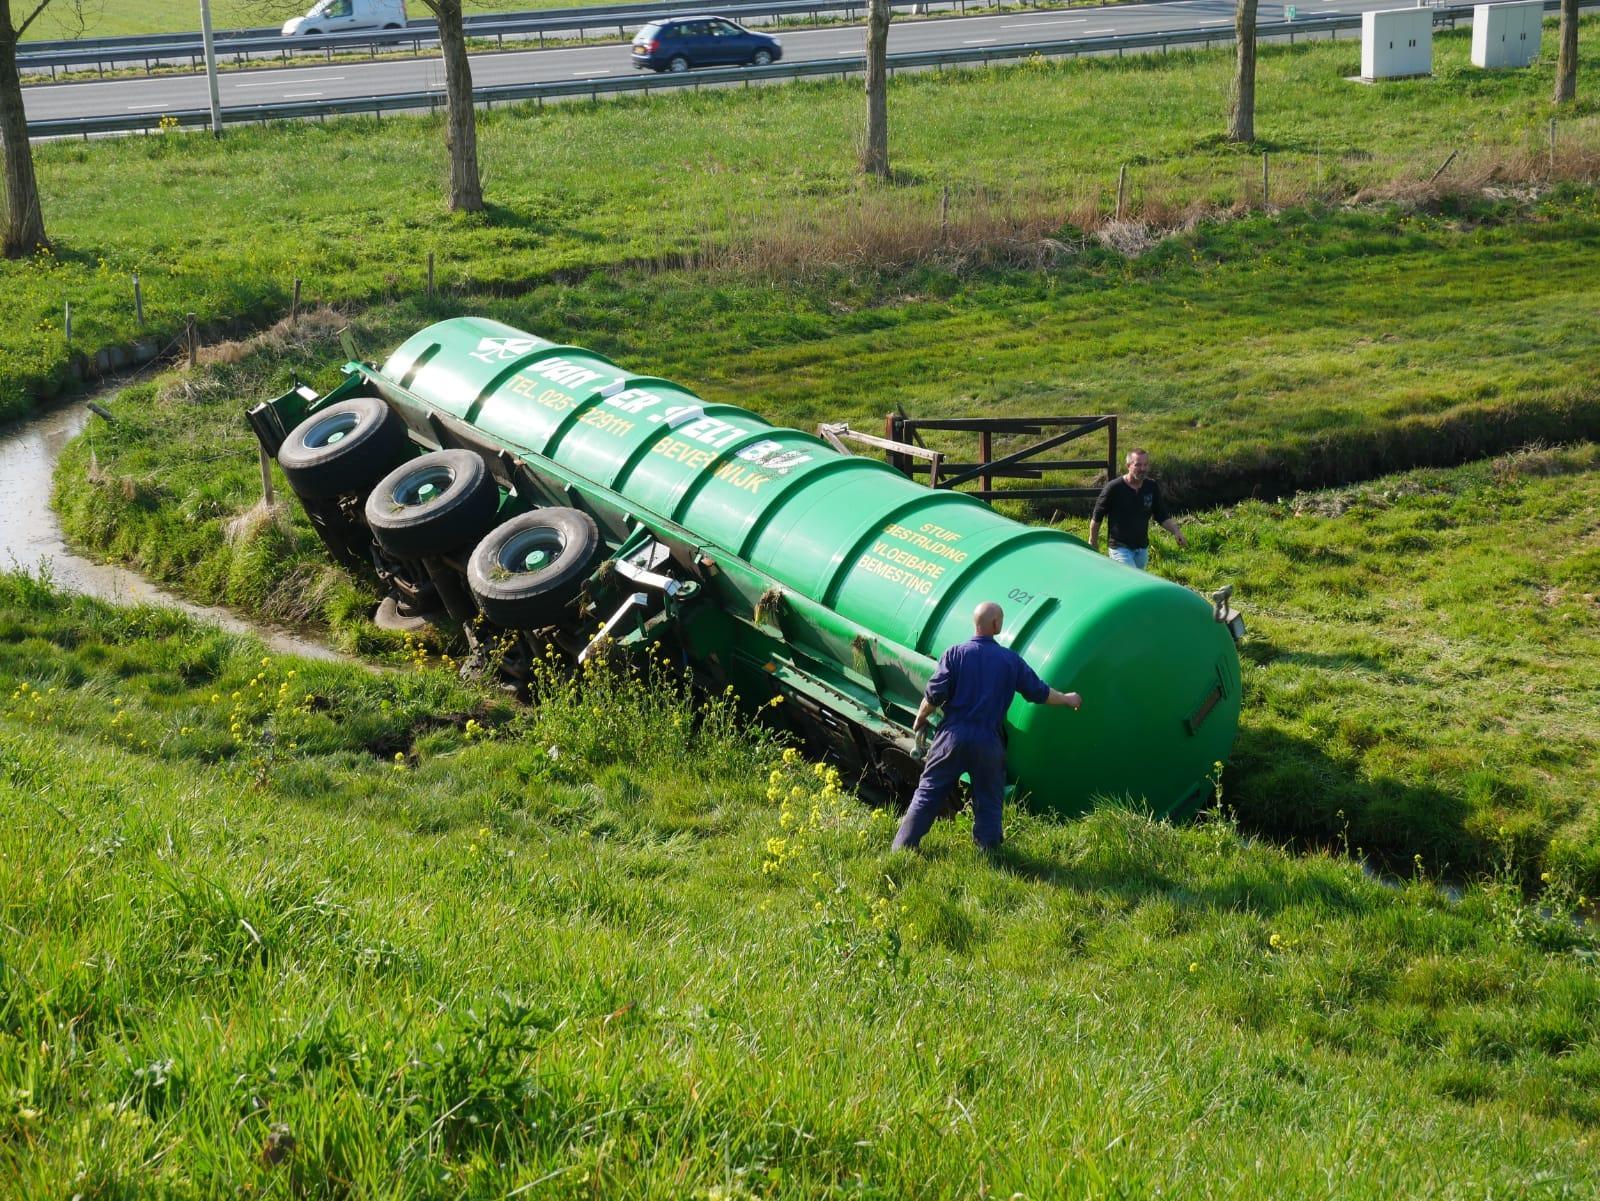 Vrachtwagenoplegger rolt van talud in Akersloot